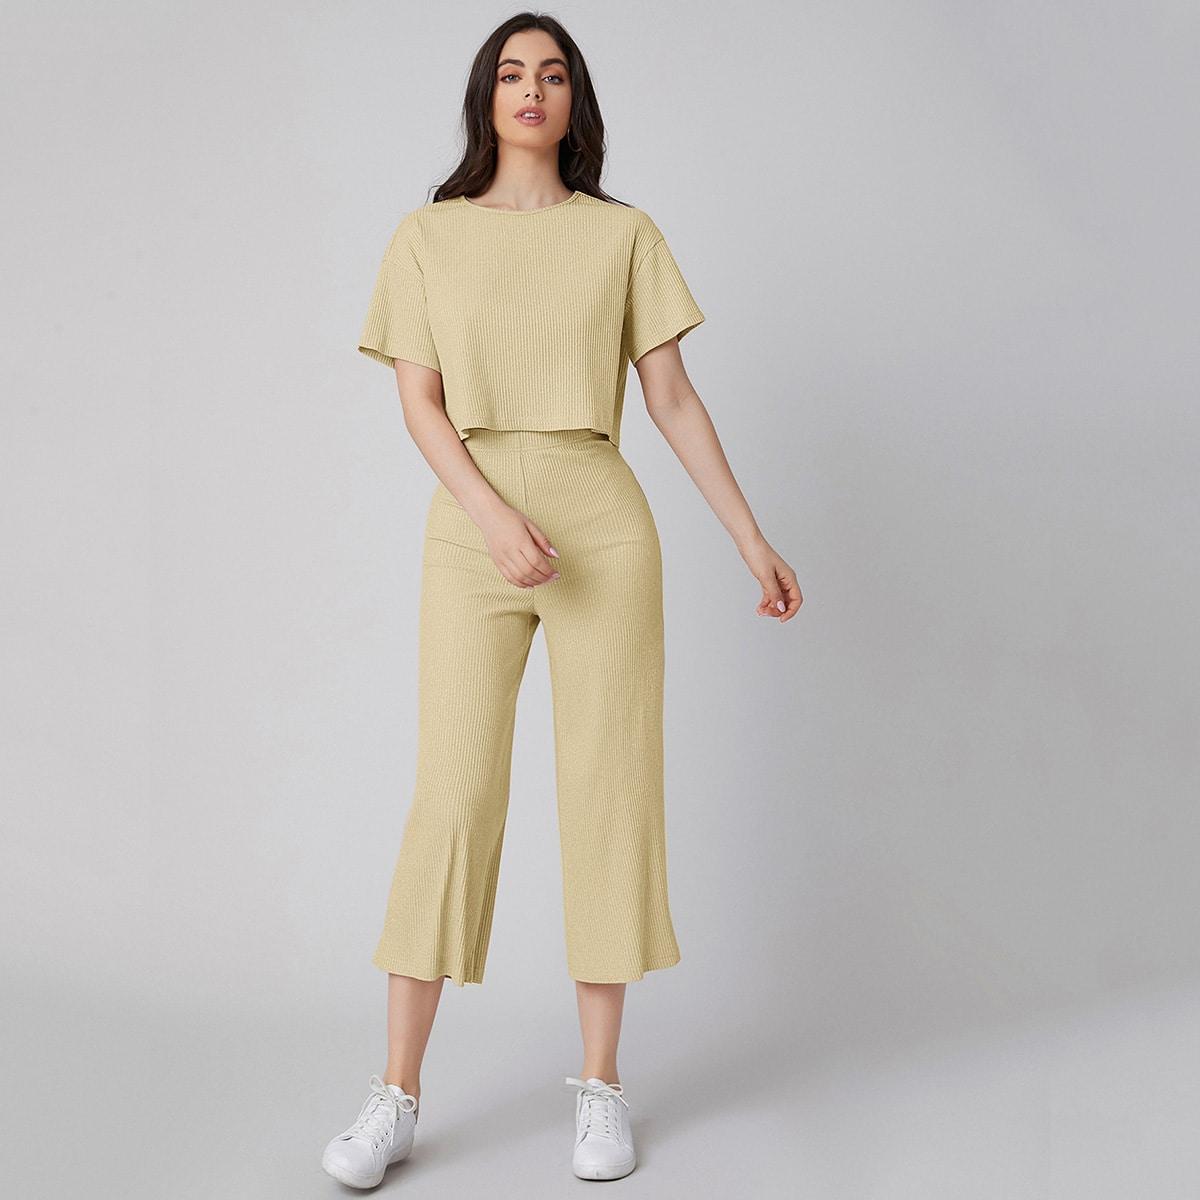 Drop Shoulder Strick Top & Capris Hose Set